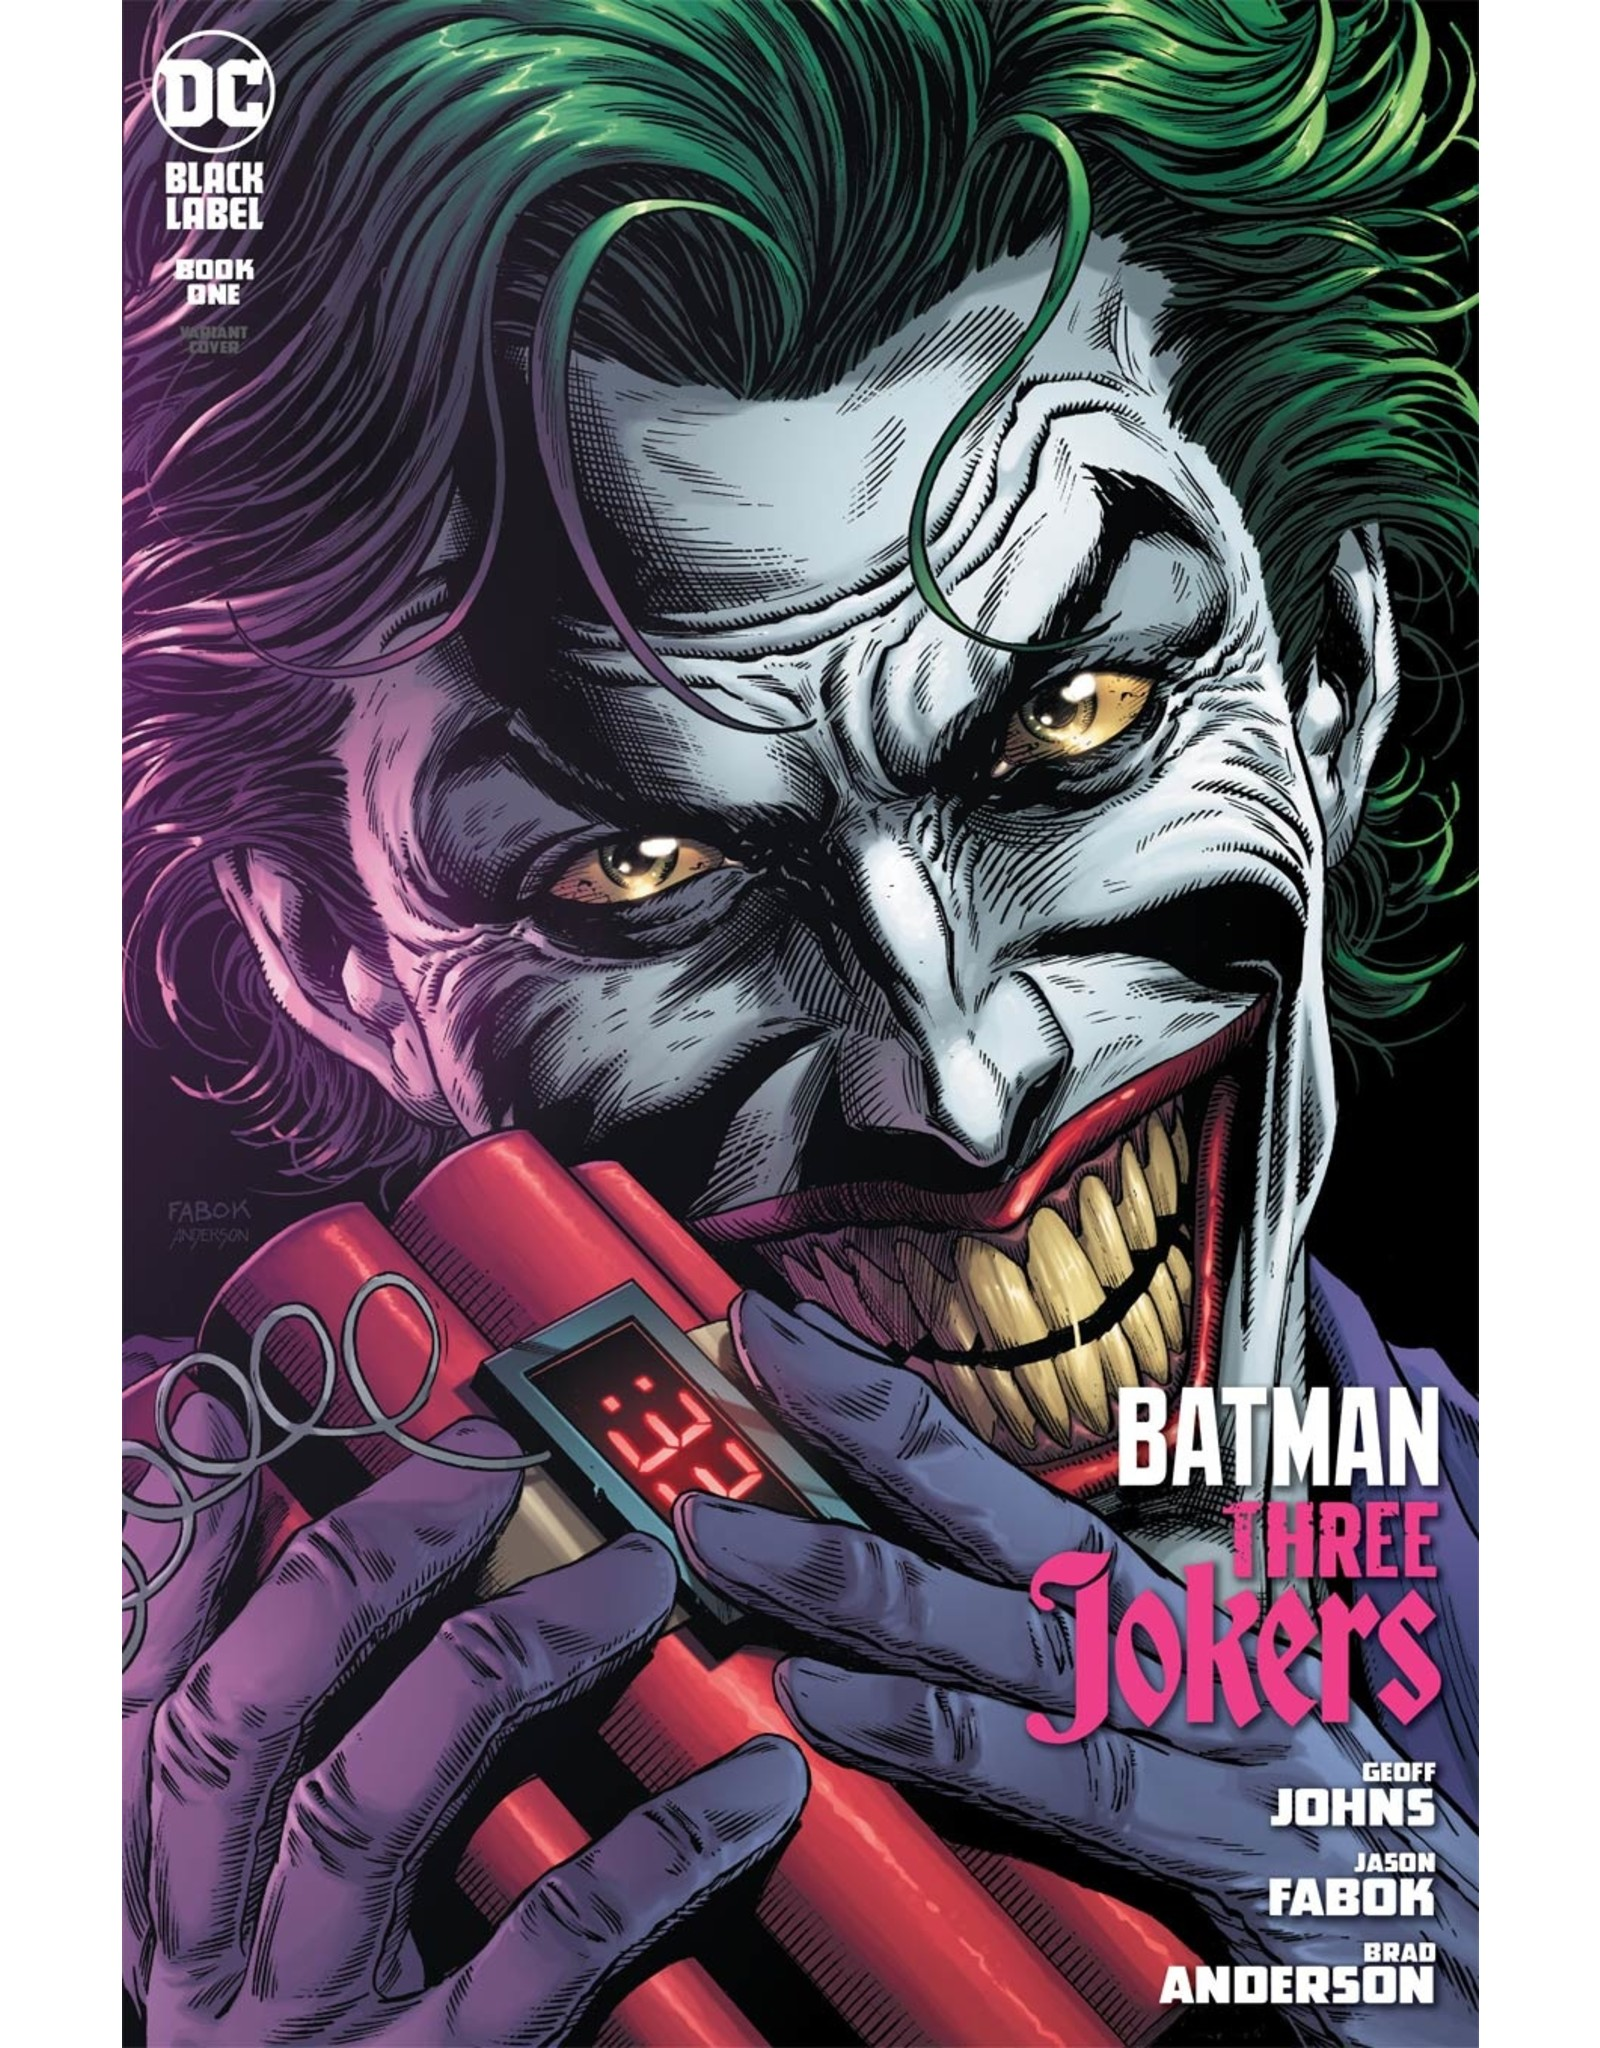 DC COMICS BATMAN THREE JOKERS #1 (OF 3) PREMIUM VAR C